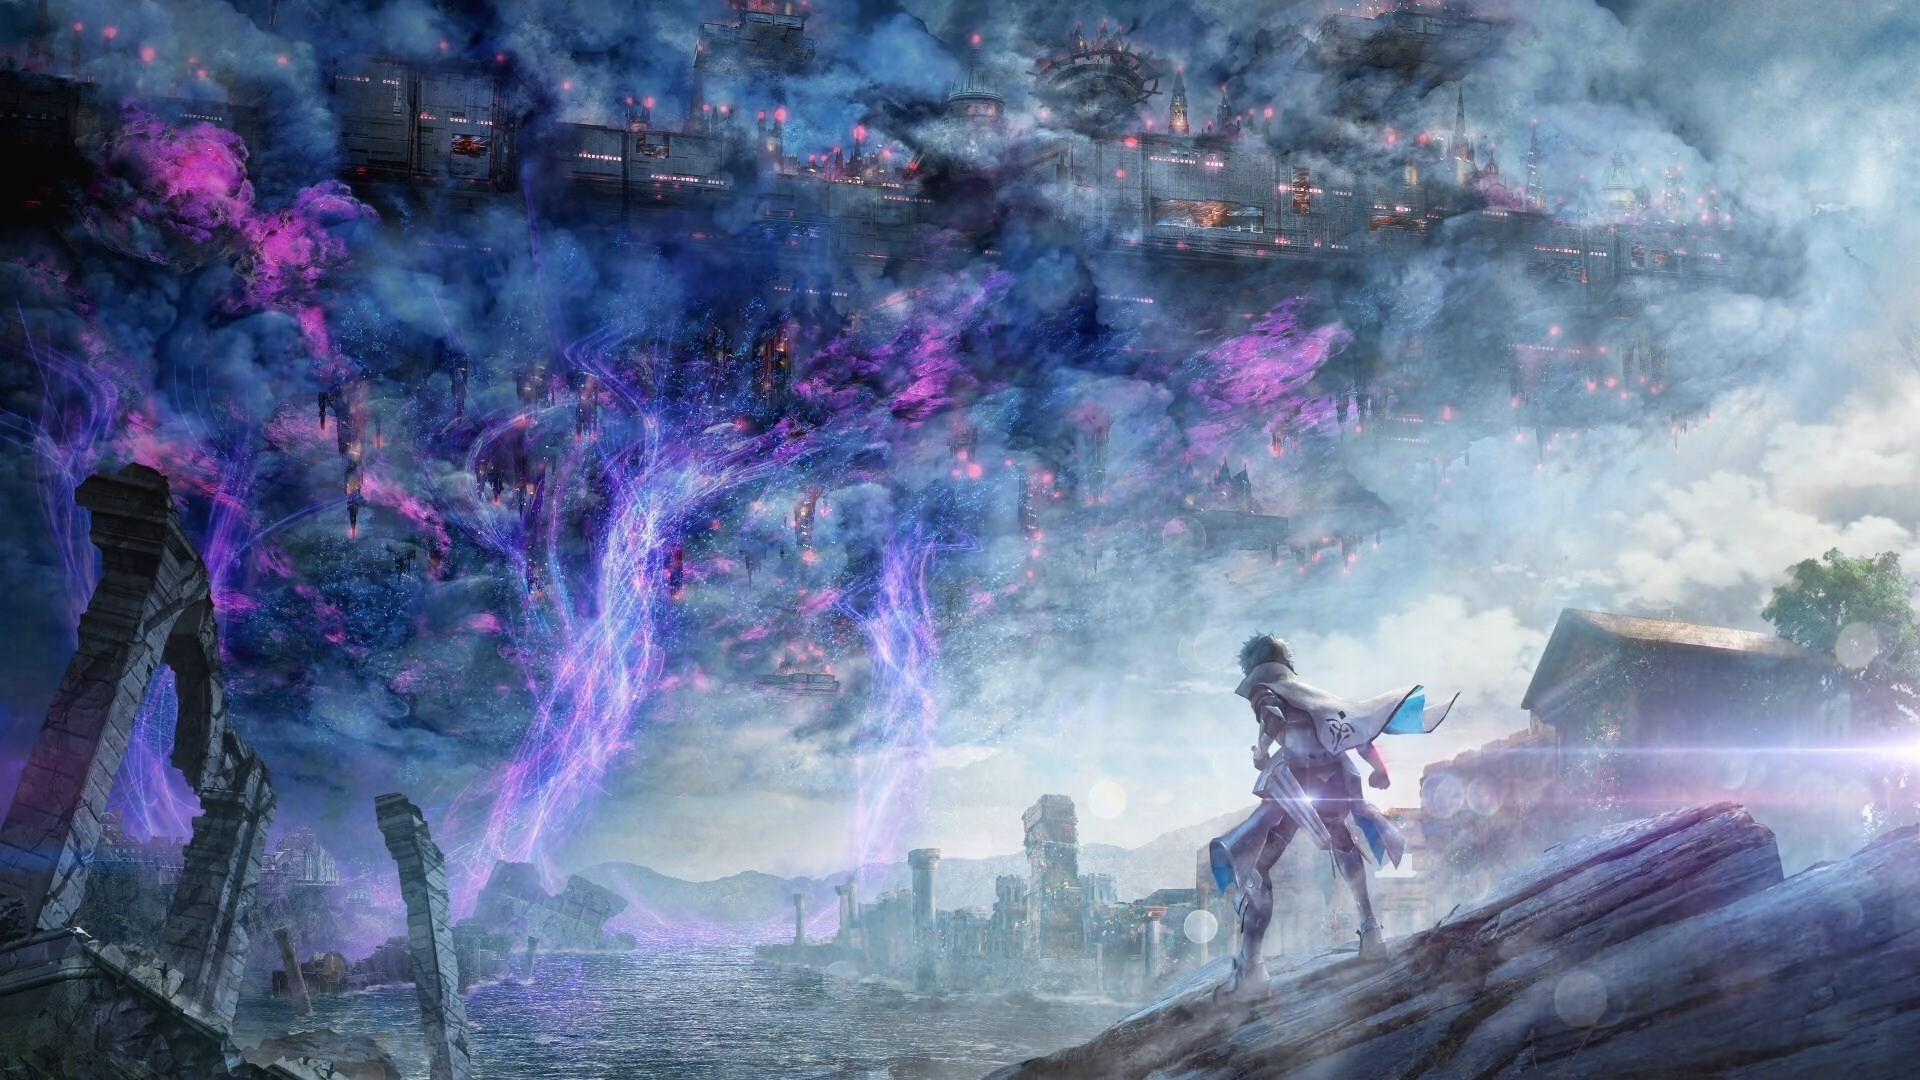 Res: 1920x1080, Fate Extella, Link, Magic, Fantasy, Anime Boy, Sword, Back View